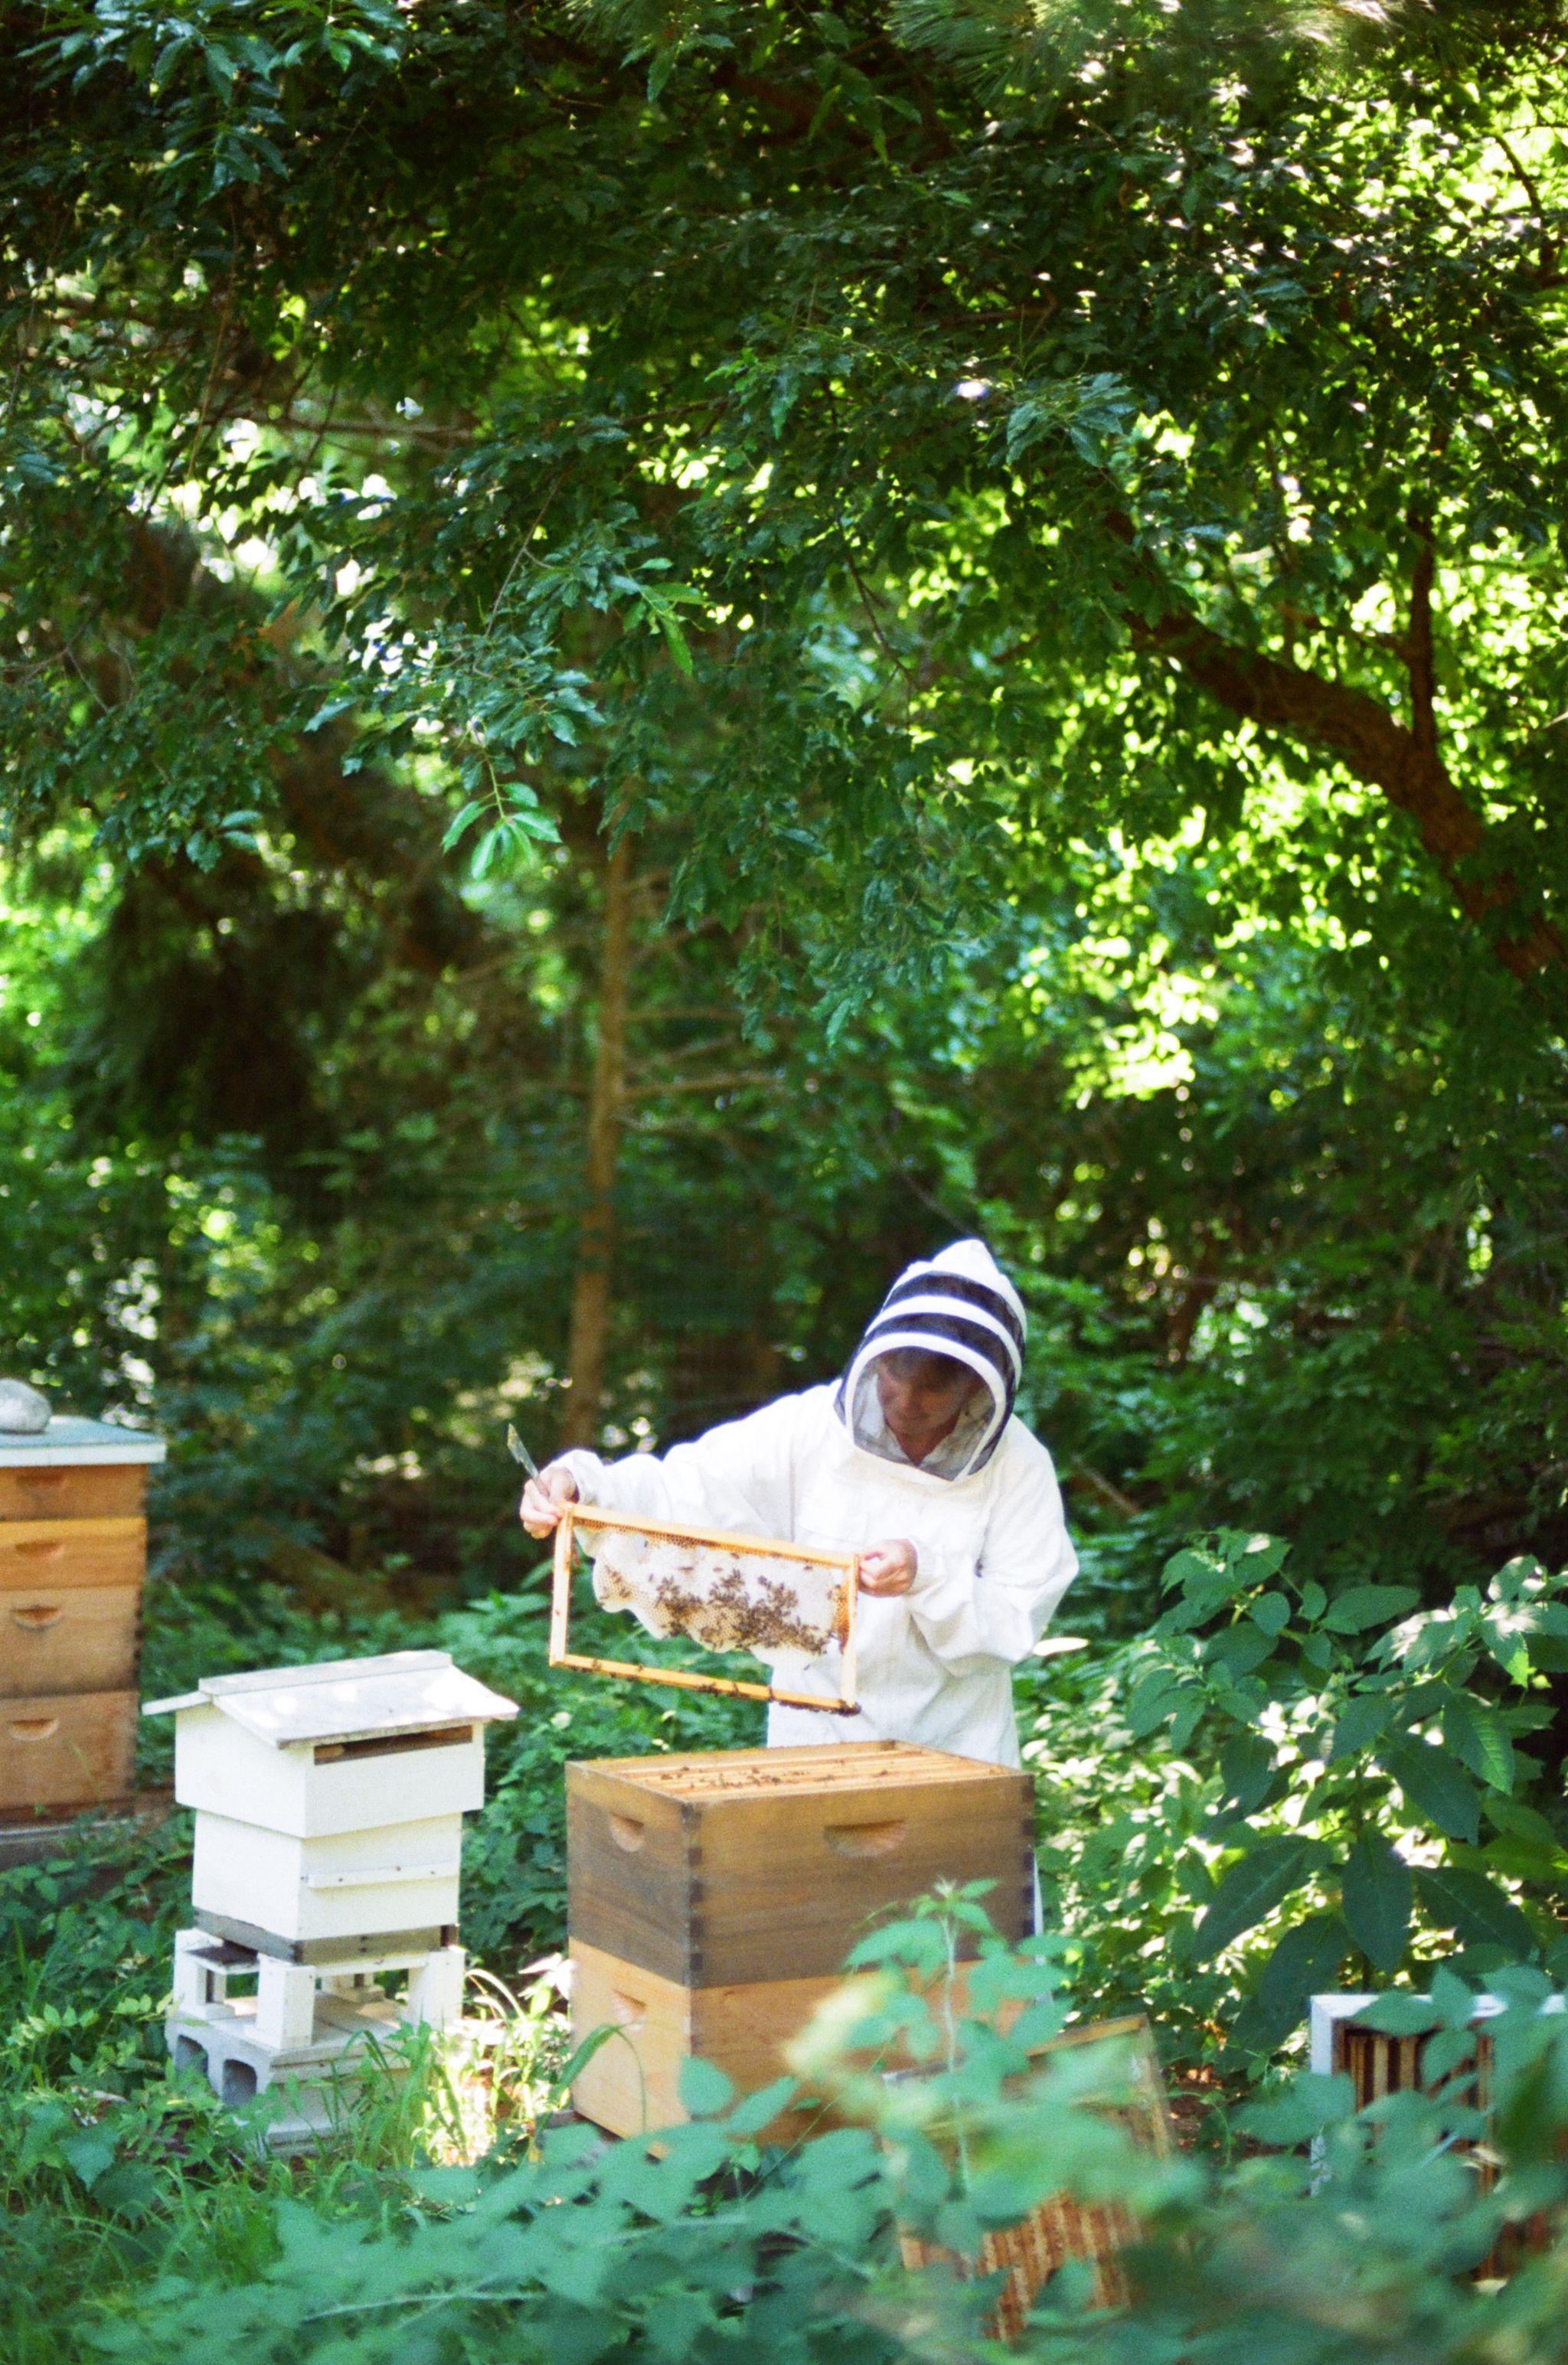 Adventures in Beekeeping: Part 1 (With images) | Bee ...